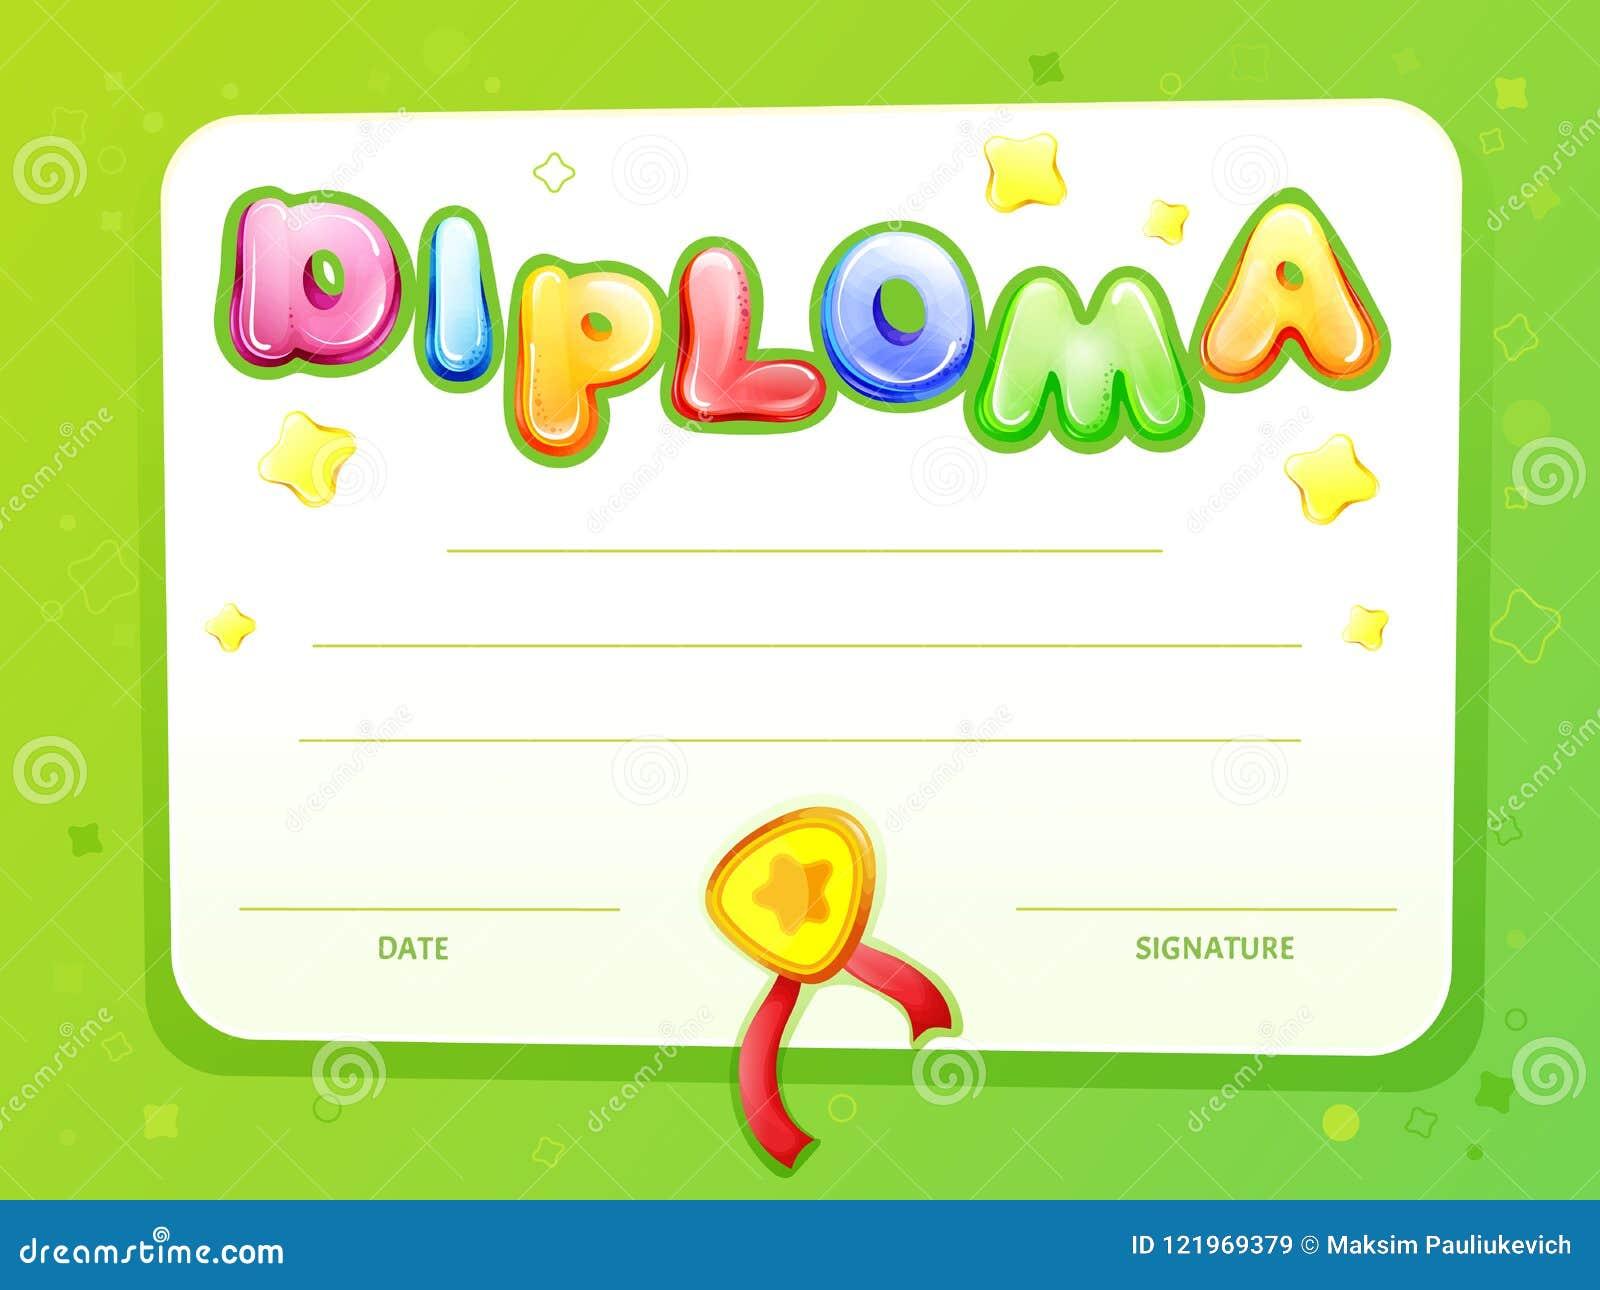 cartoon kids certificate diploma template stock illustration